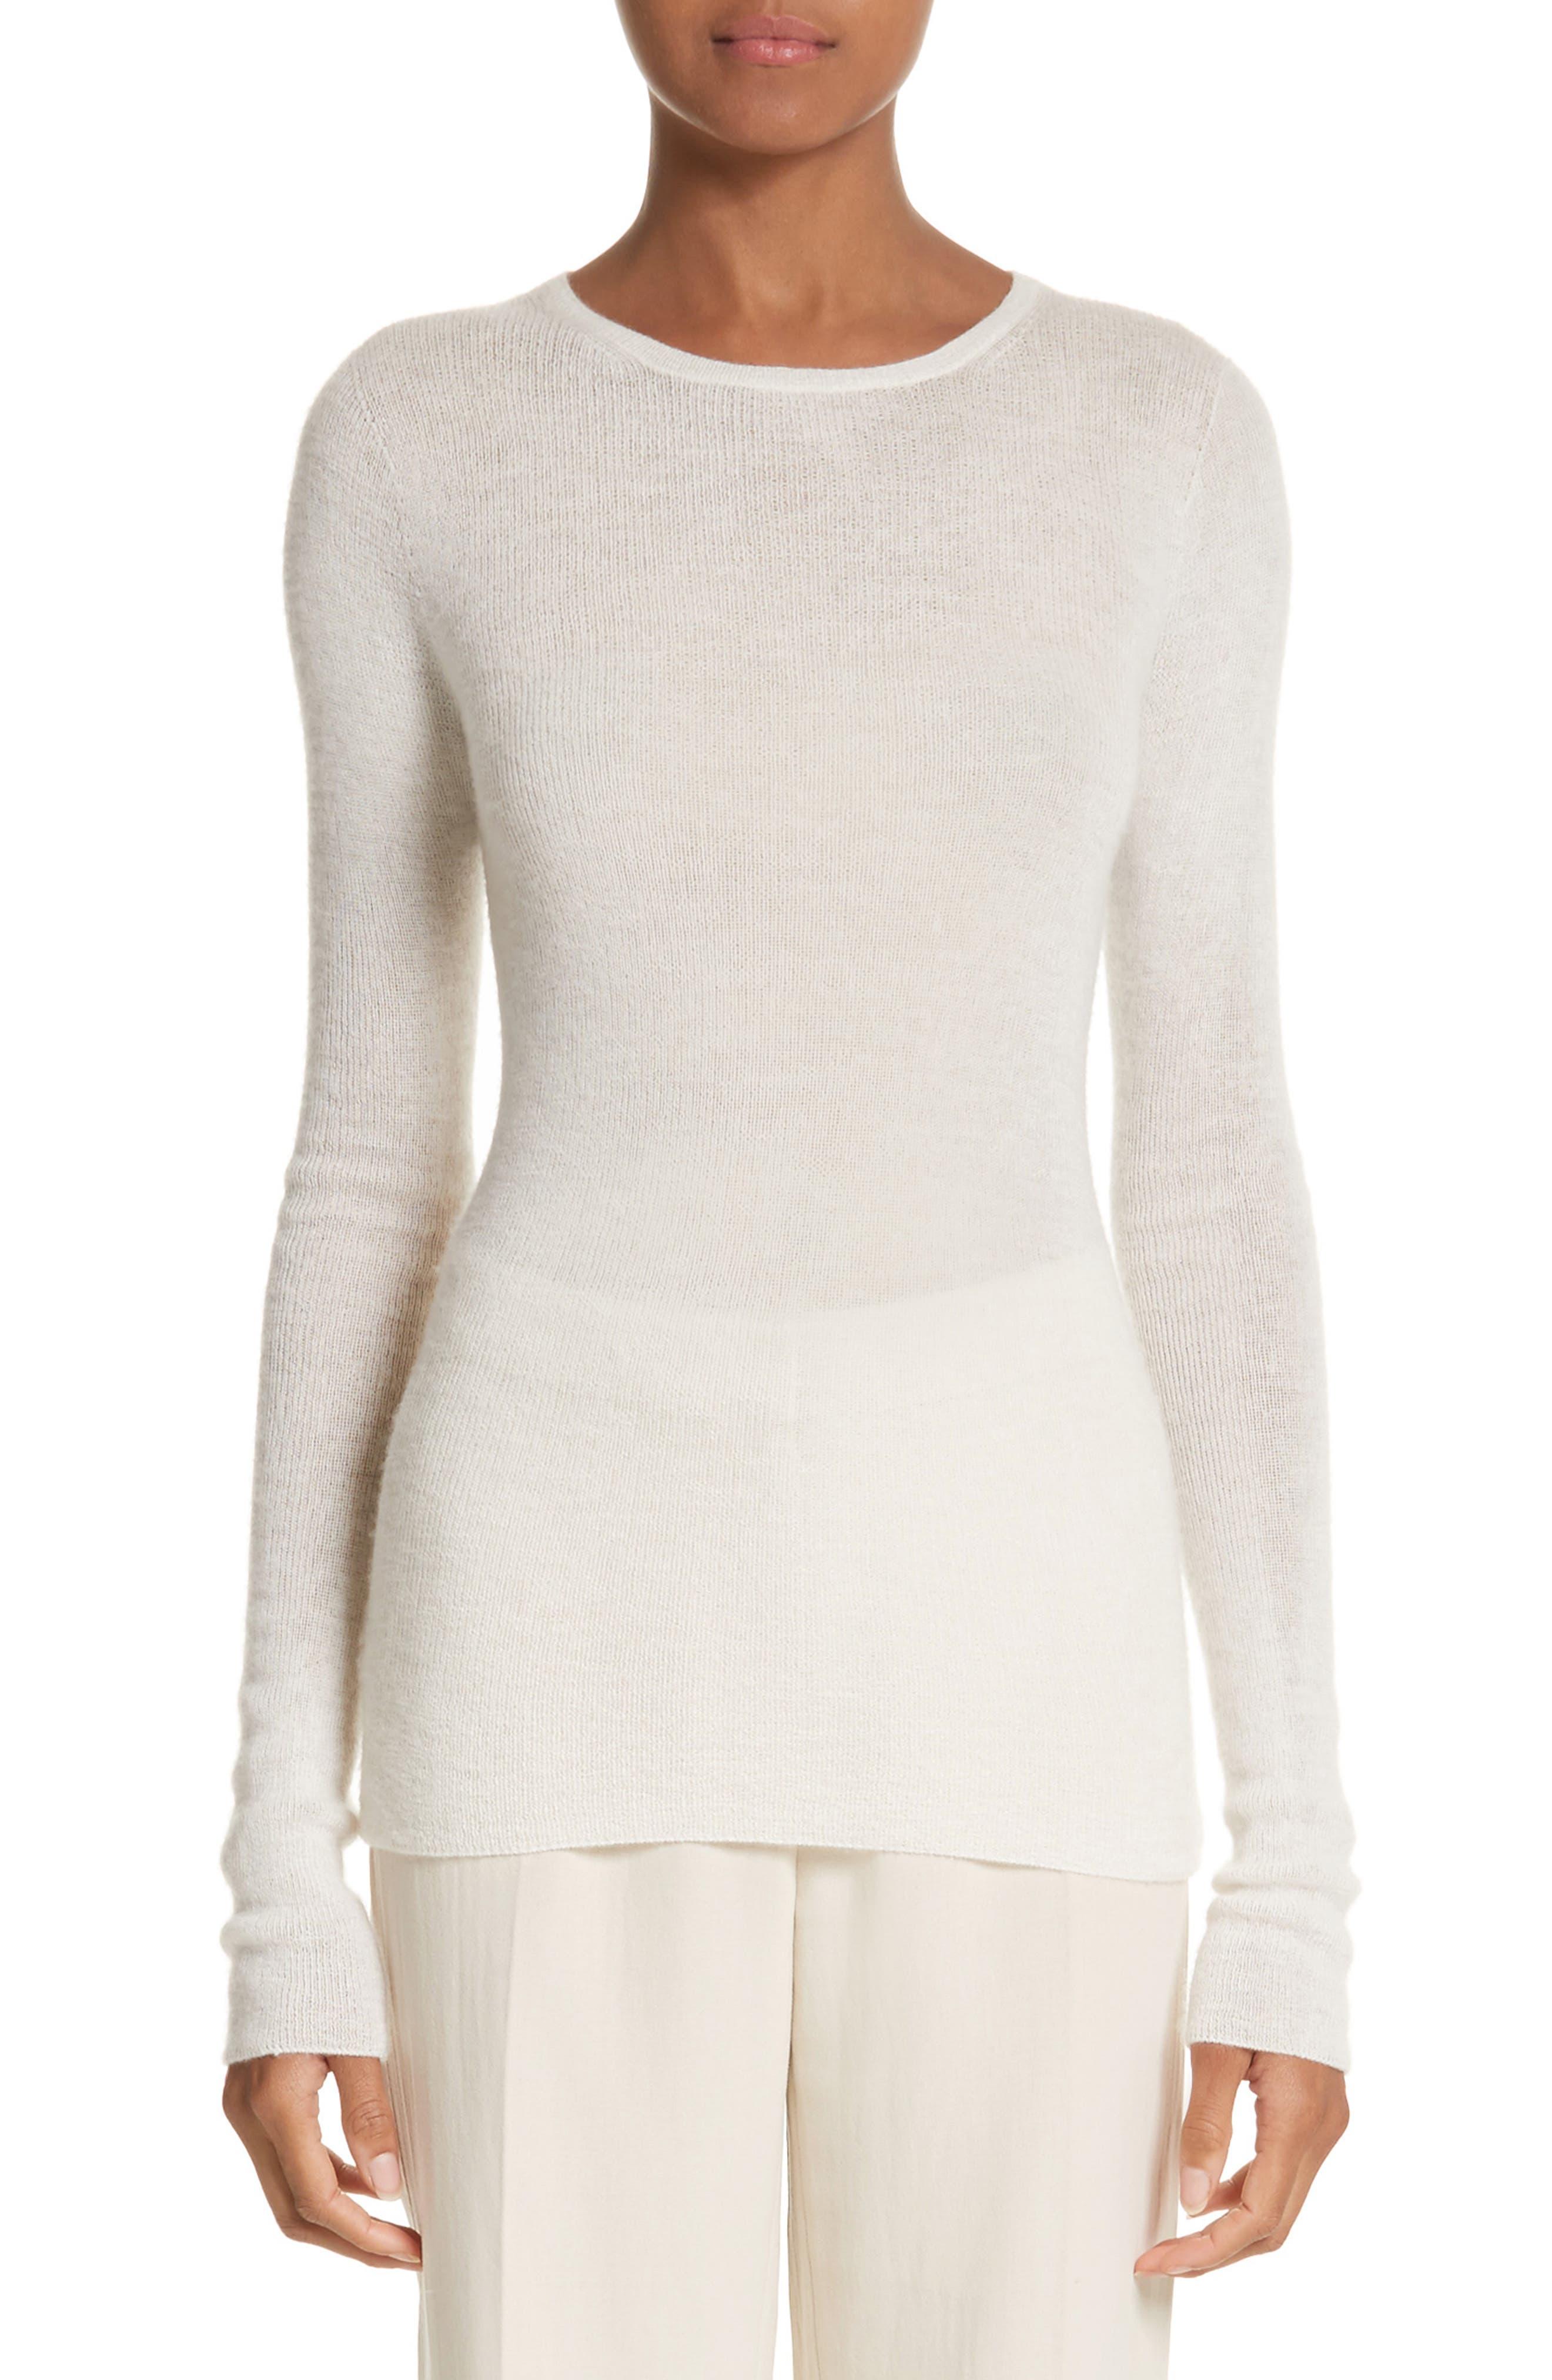 MAX MARA Cabaret Cashmere Sweater, Main, color, 110